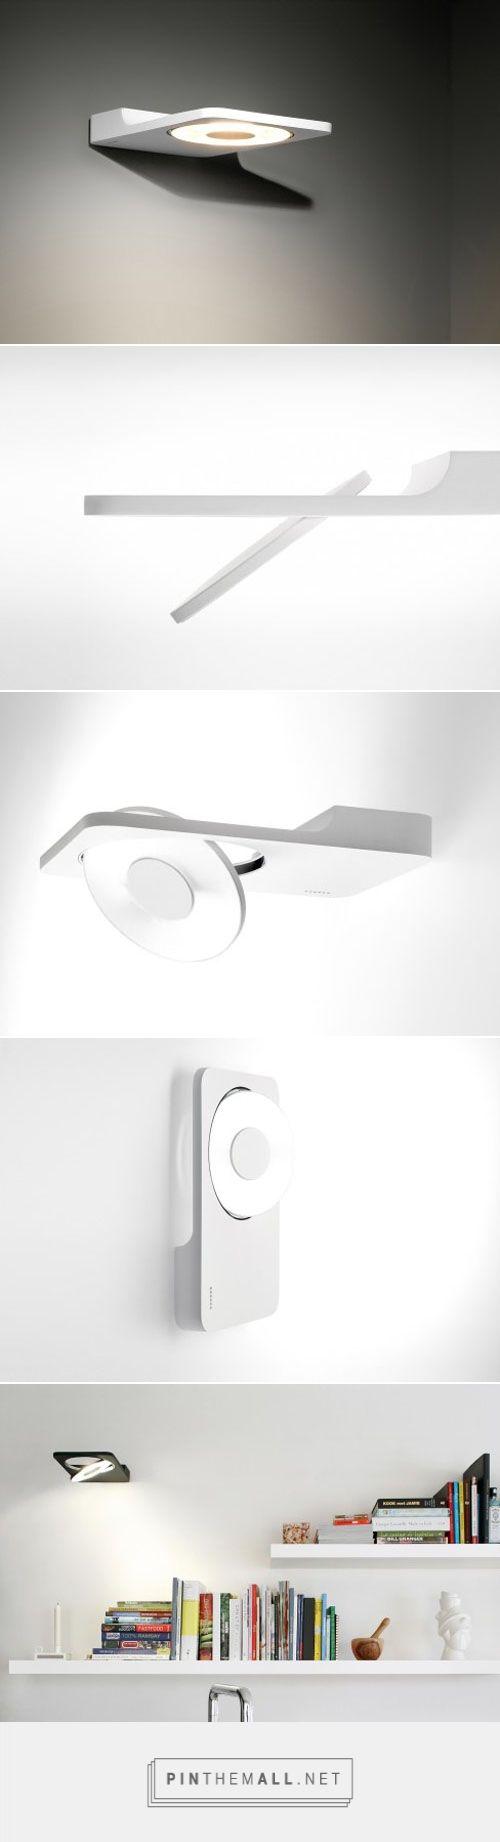 25 b sta belysningsdesign id erna p pinterest - Modular lighting paris ...